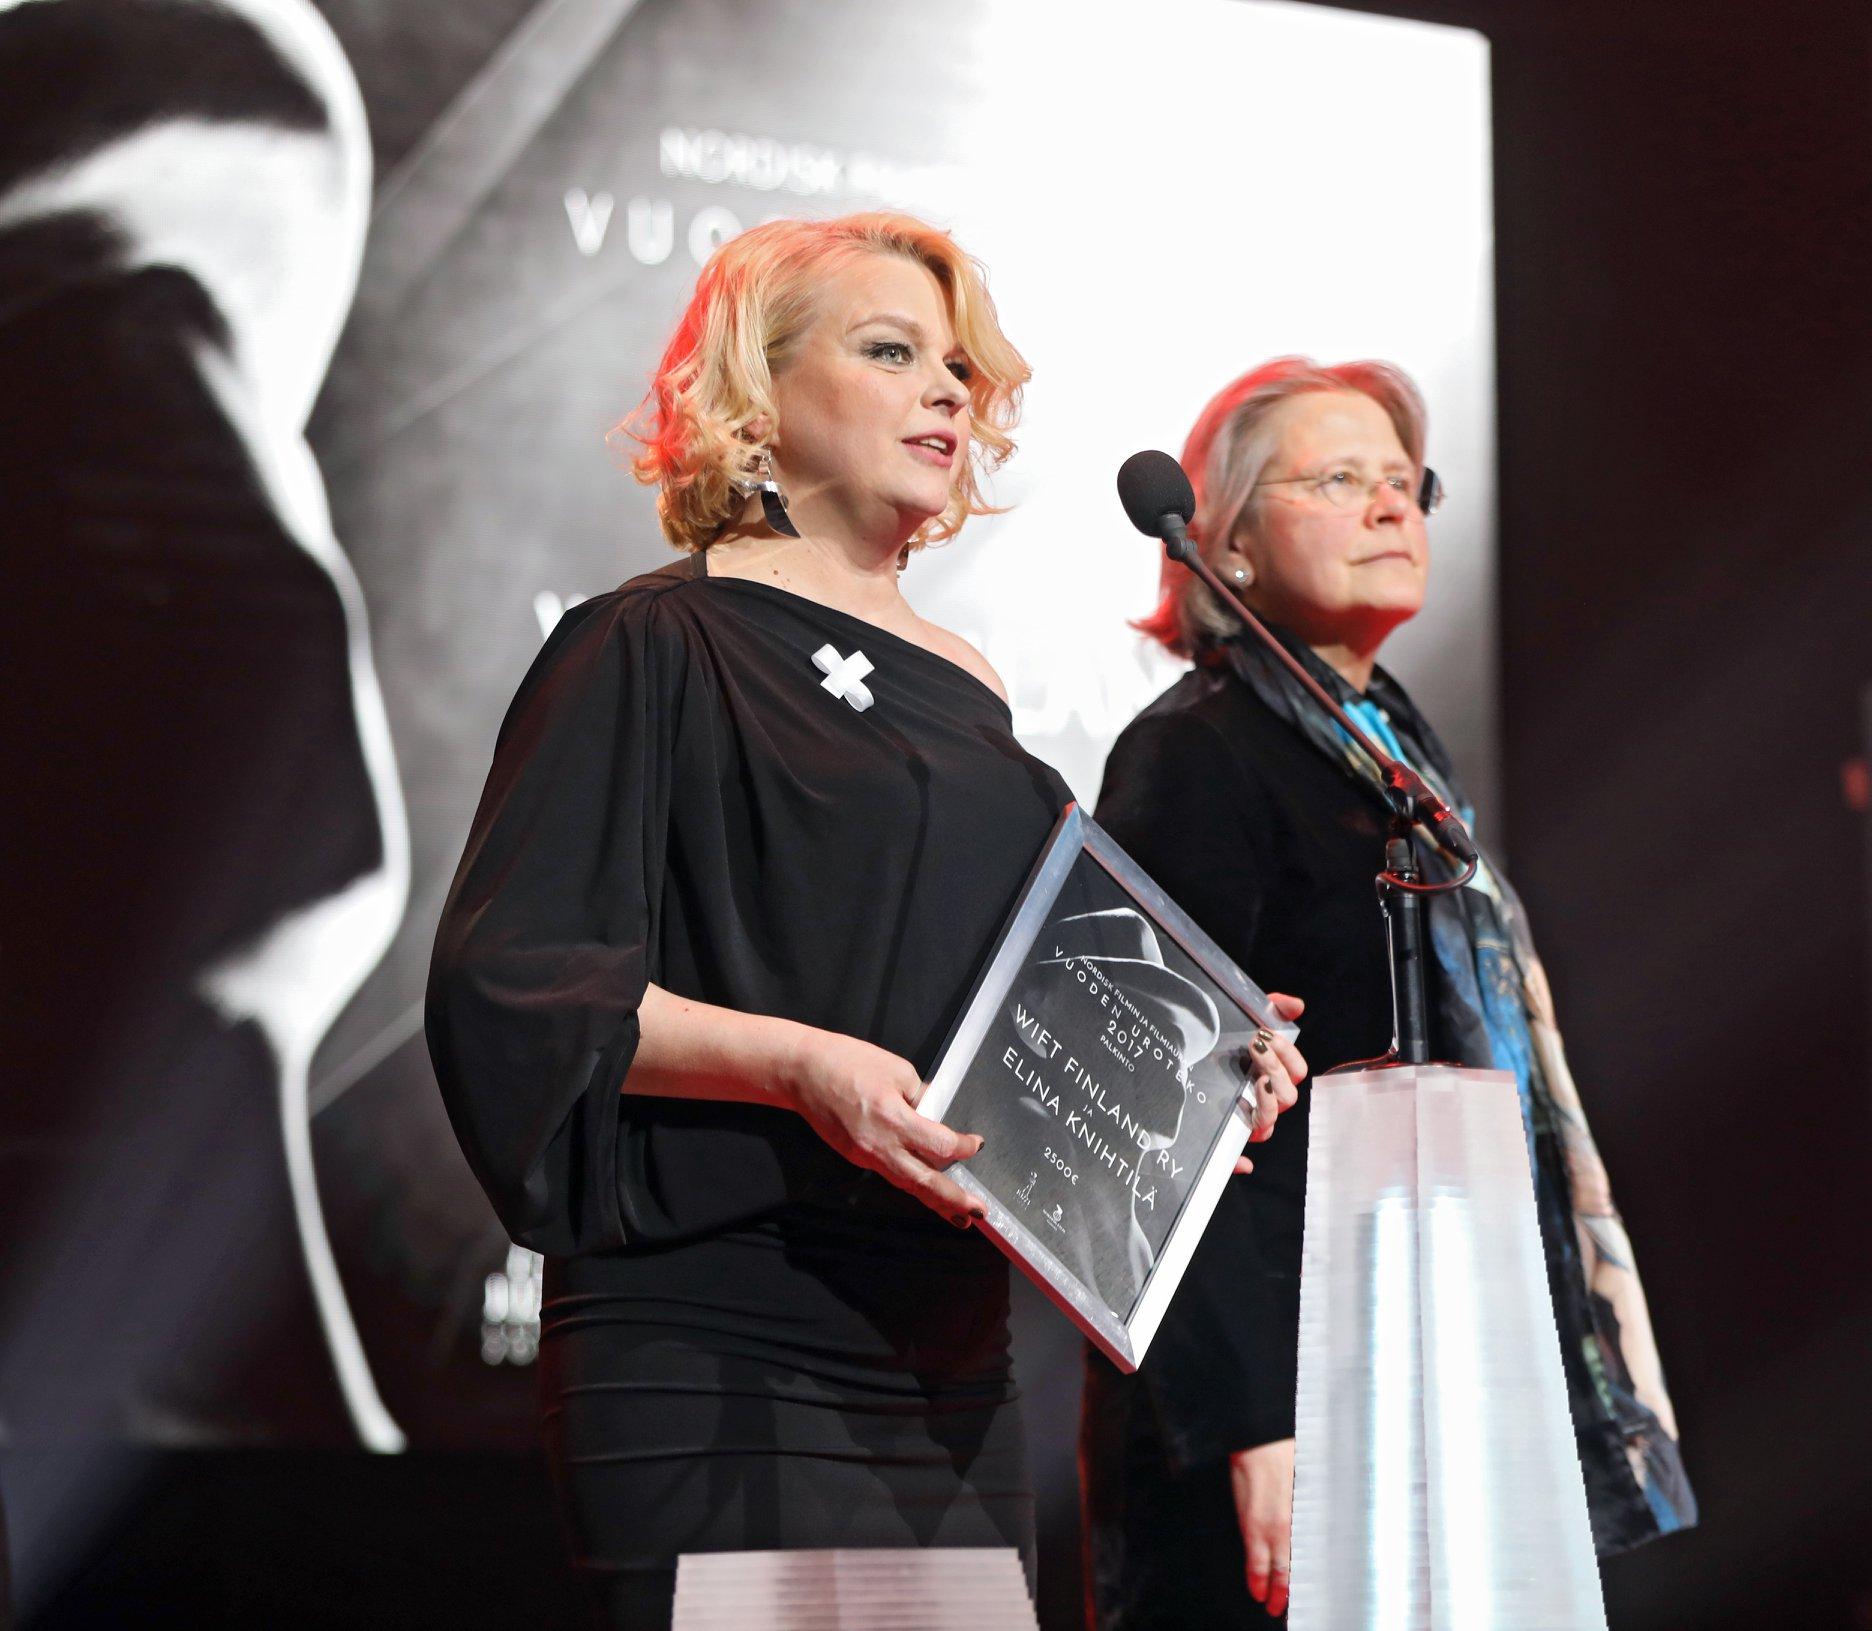 Copyright: Filmiaura / Tuomas Selänne